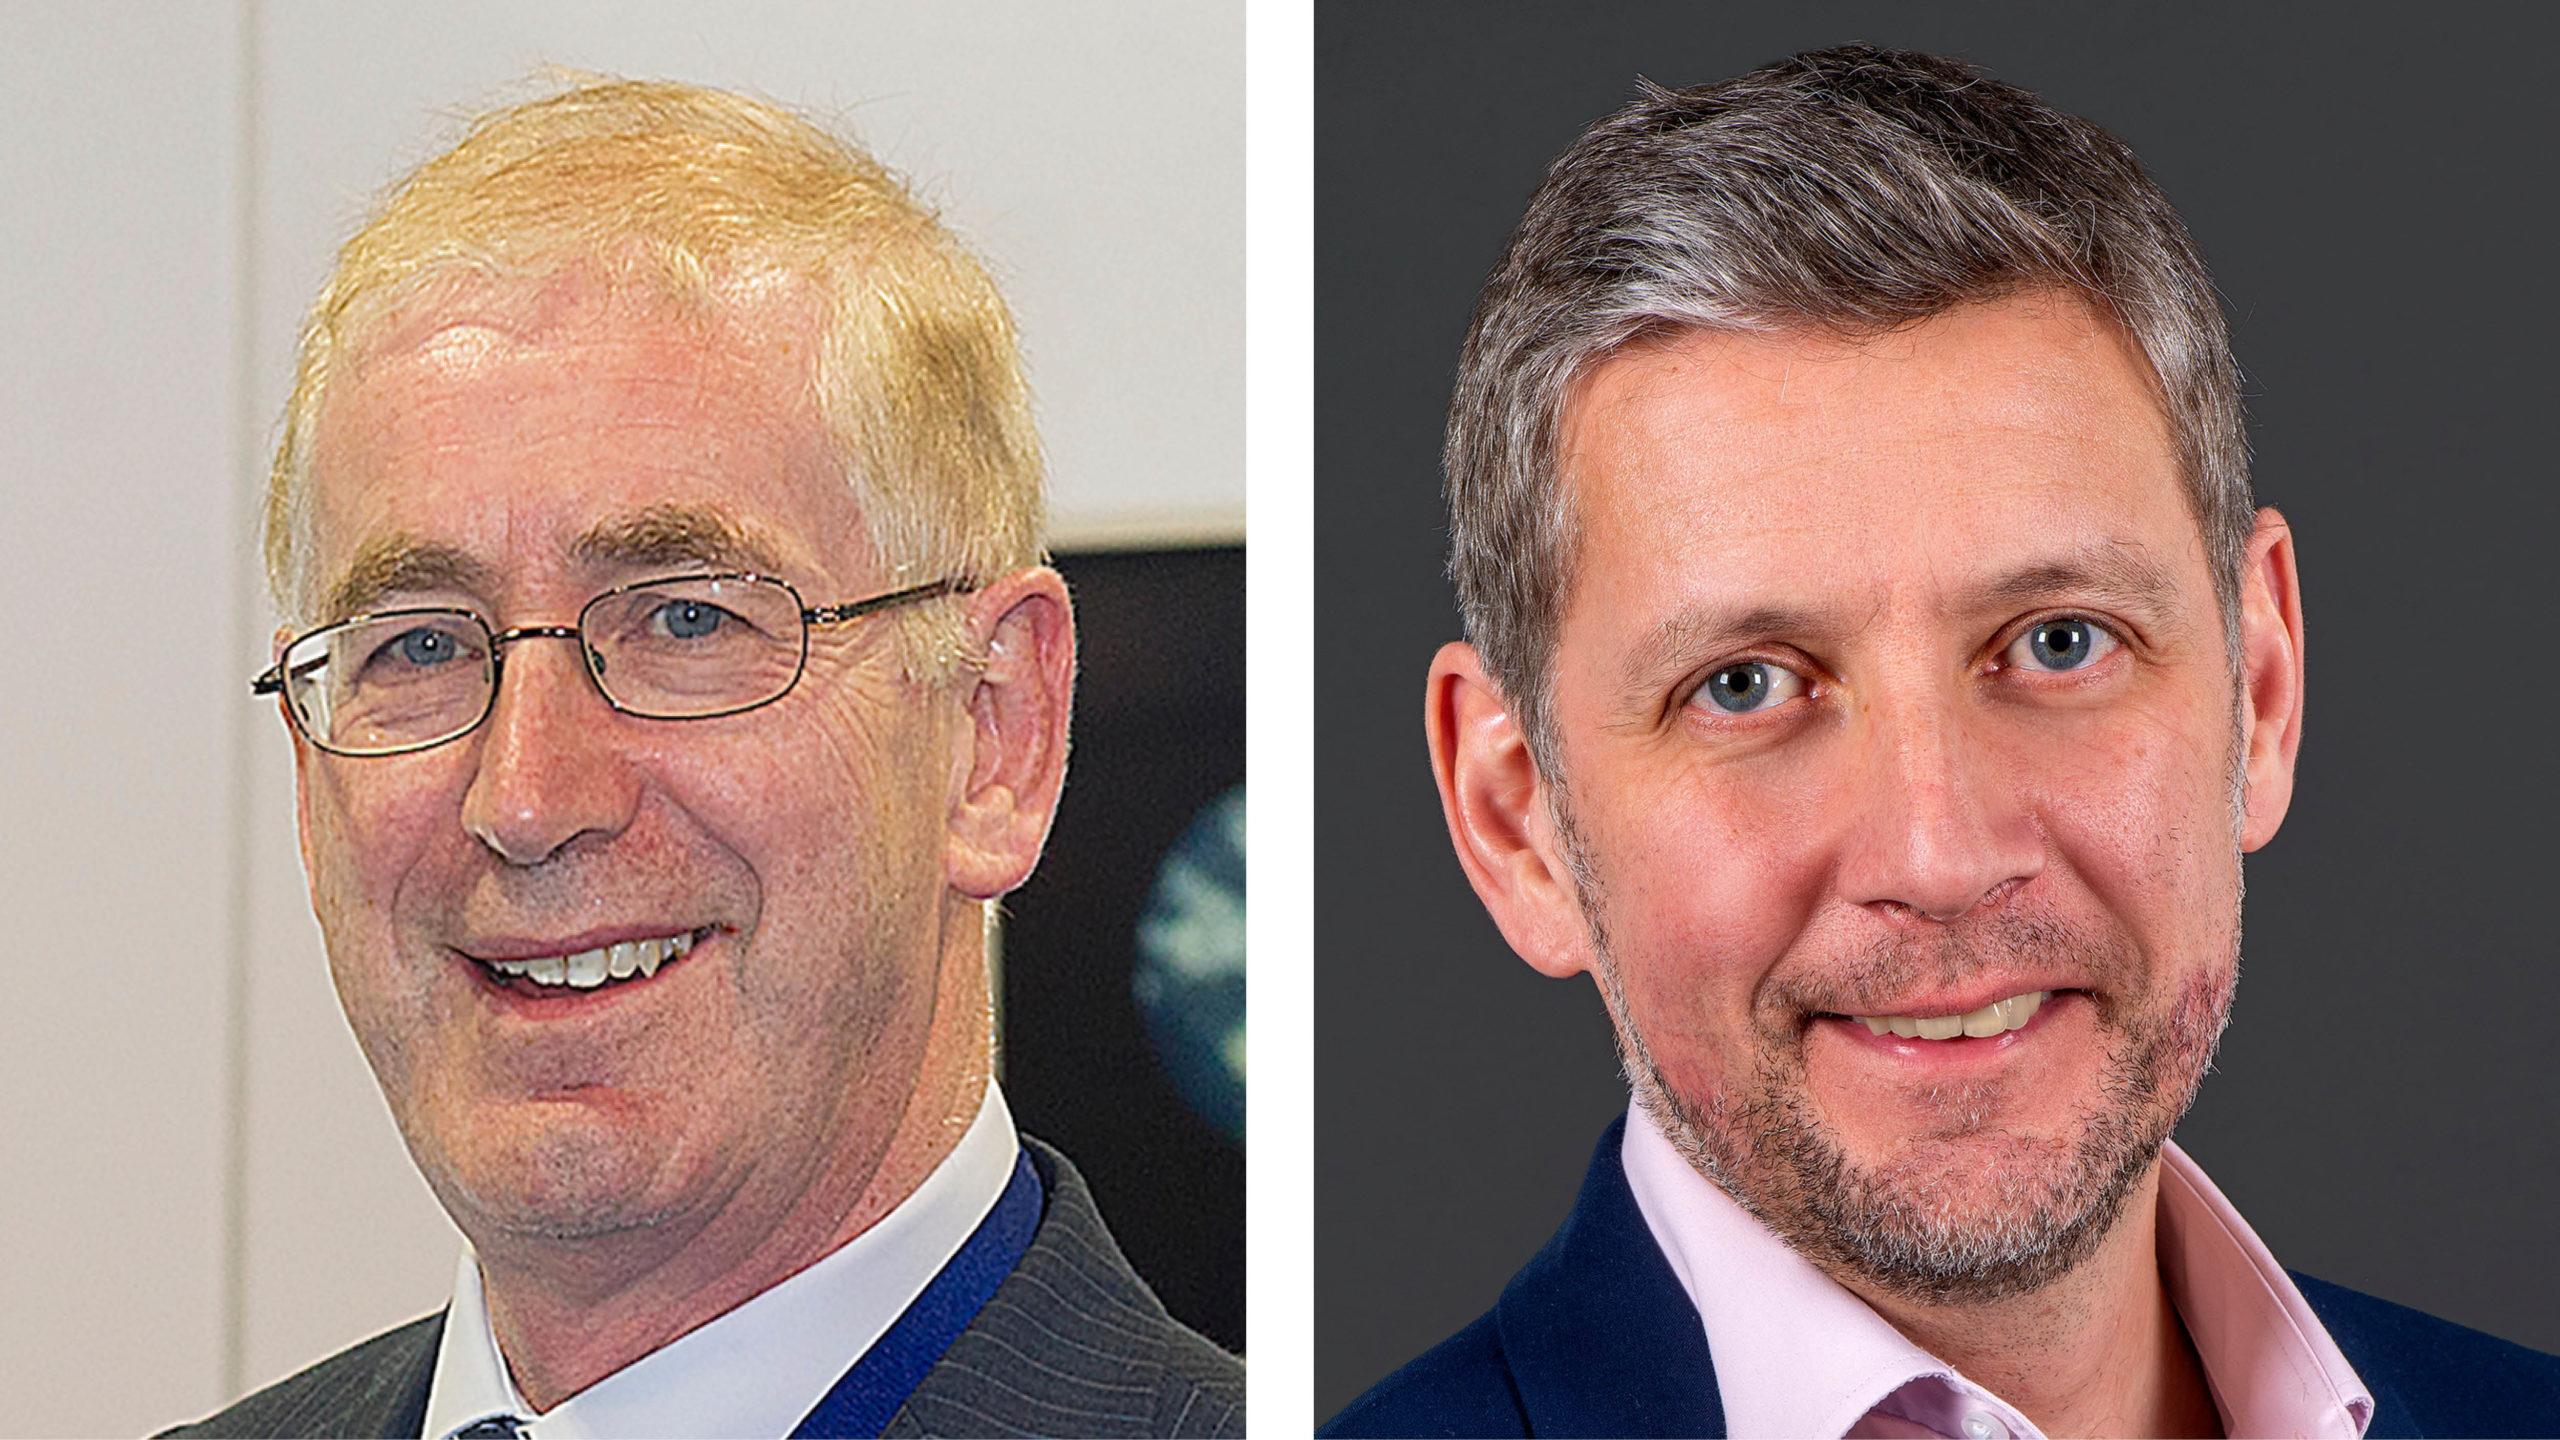 Kieran O'Flynn and John Mcgrath, clinical leads for urology